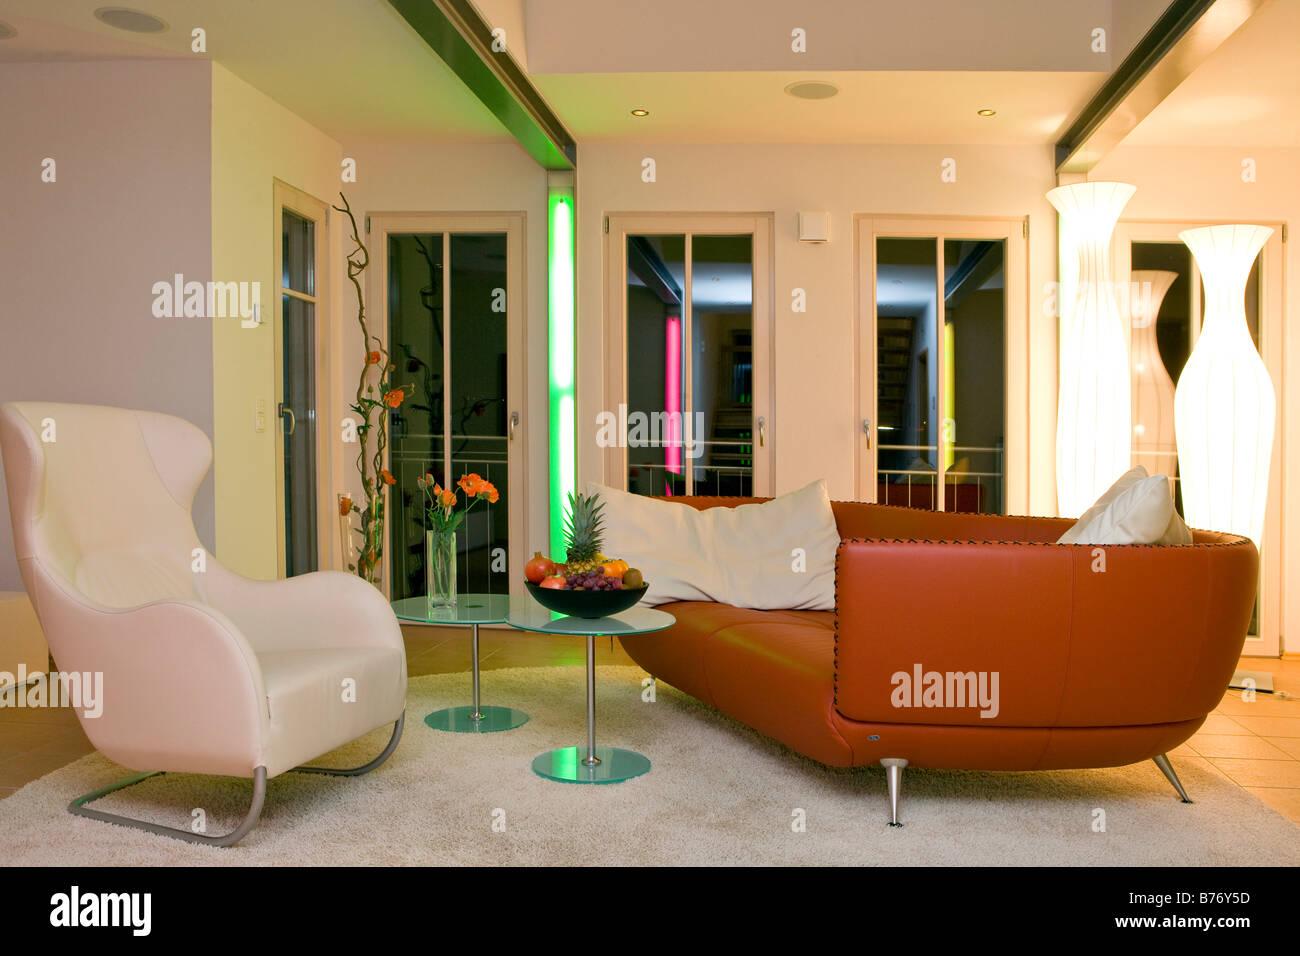 Modernes Wohnzimmer Modern Living Room Stock Photo 21665993 Alamy